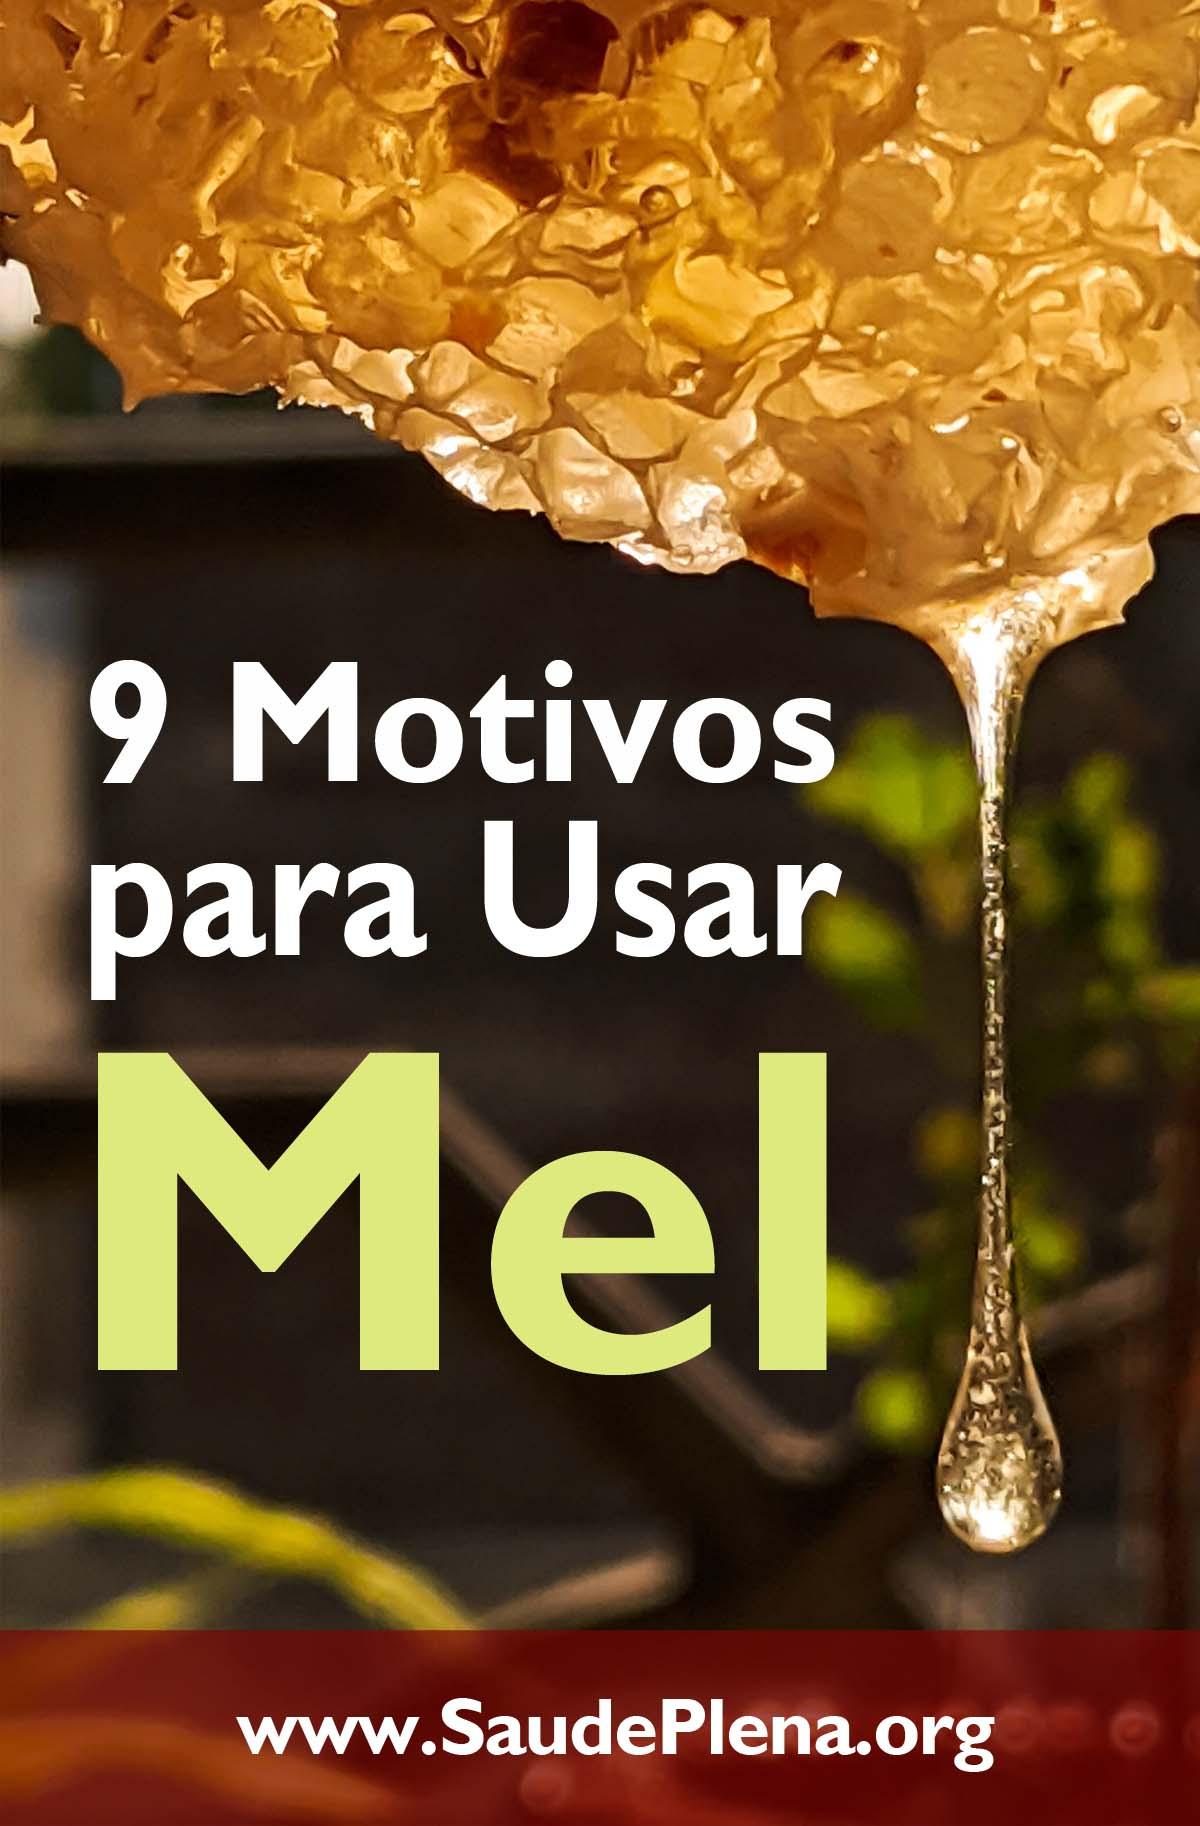 9 Motivos para Usar Mel